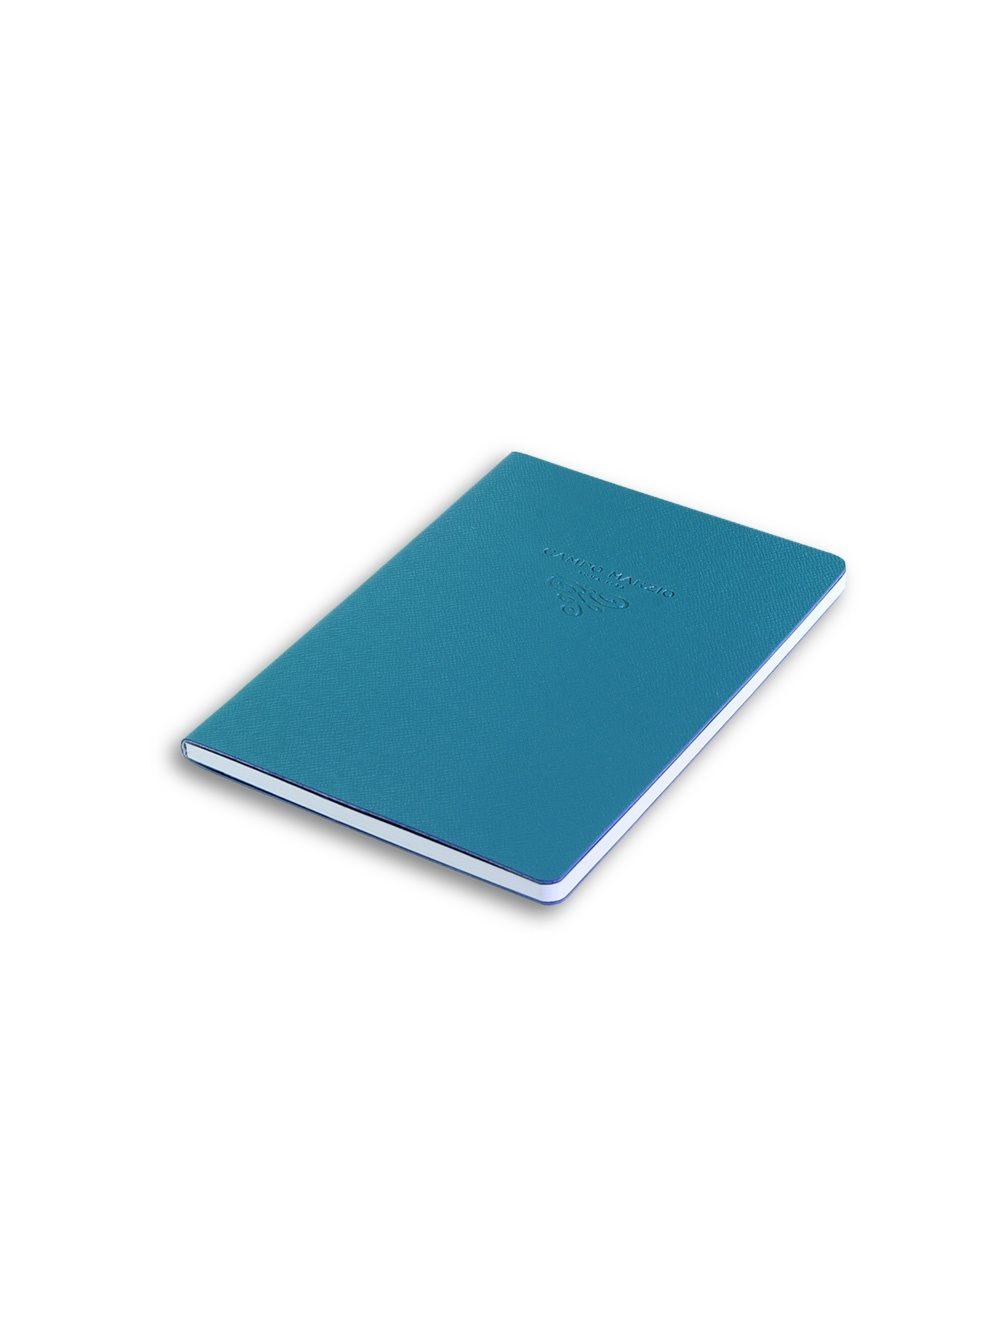 Journal 11x16 cm - White Internal Paper - Avion